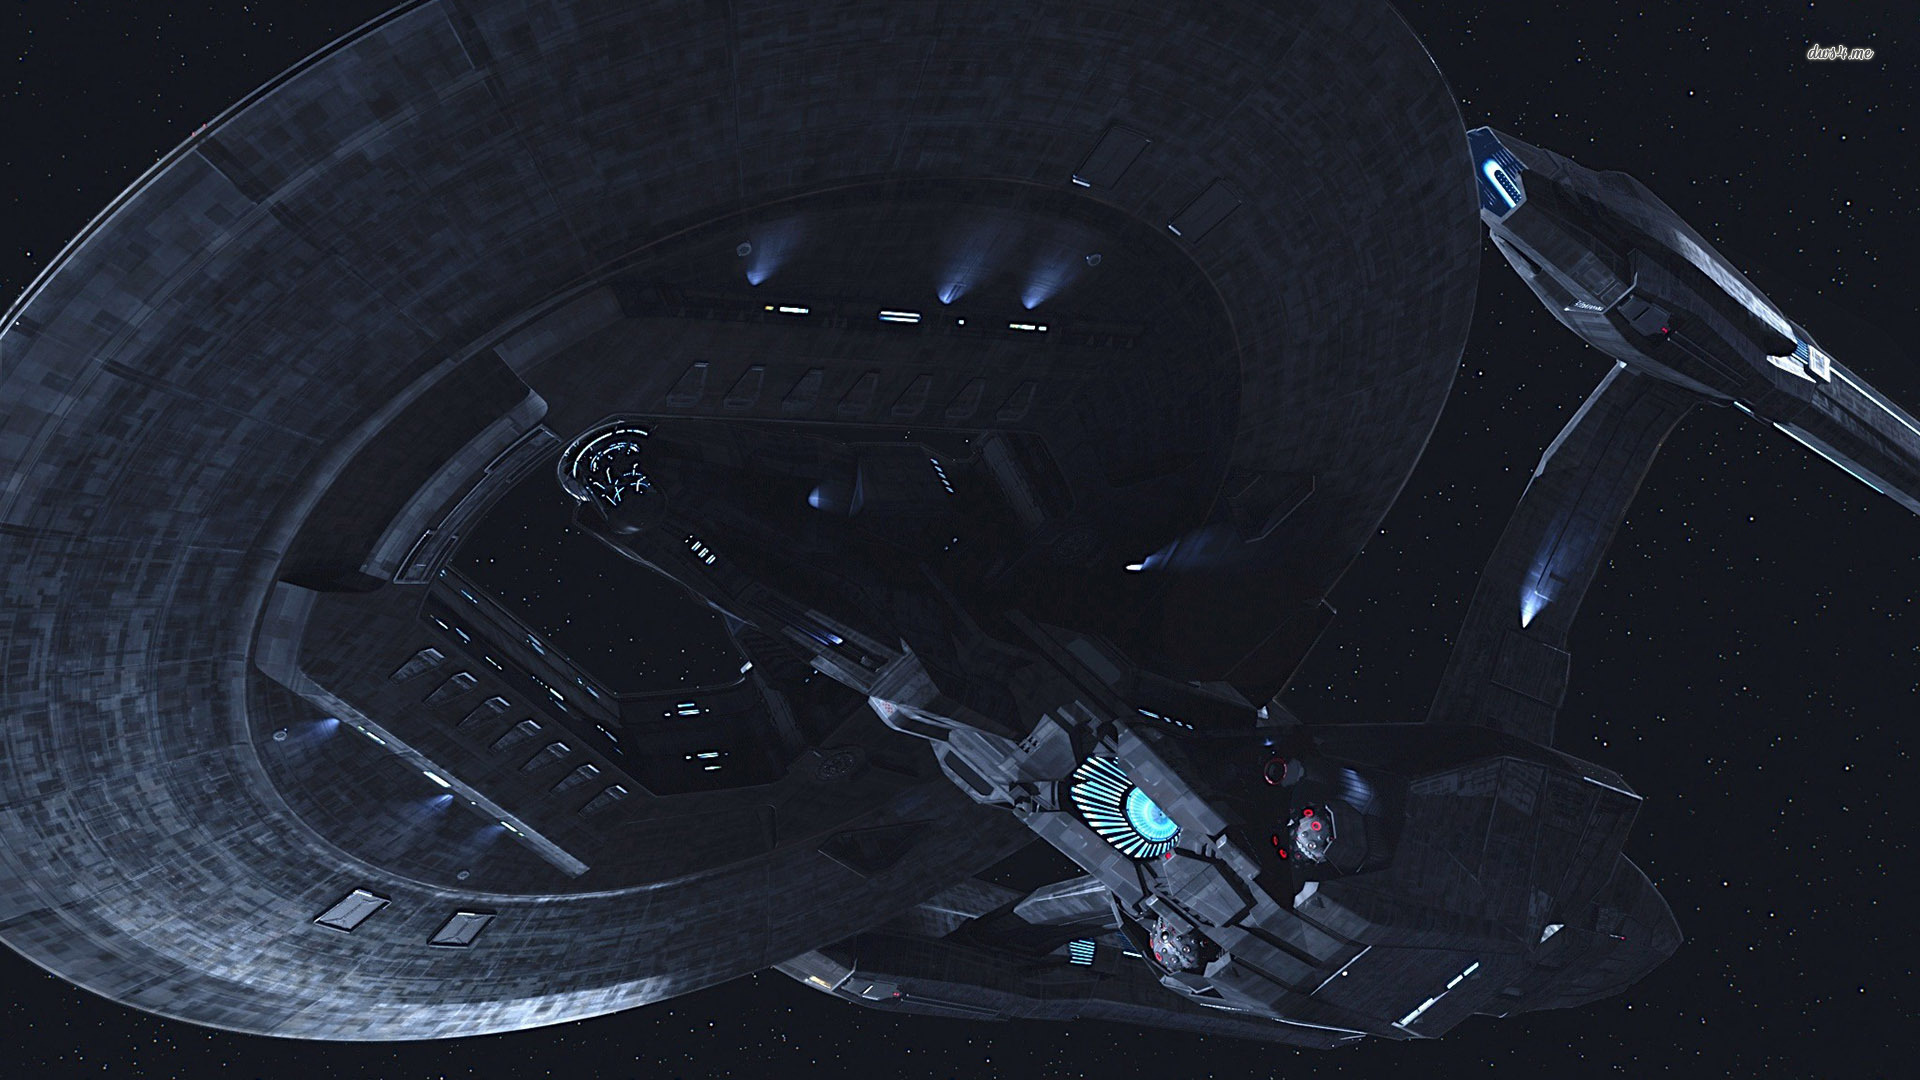 Star Trek 1080p Wallpaper Posted By Sarah Tremblay